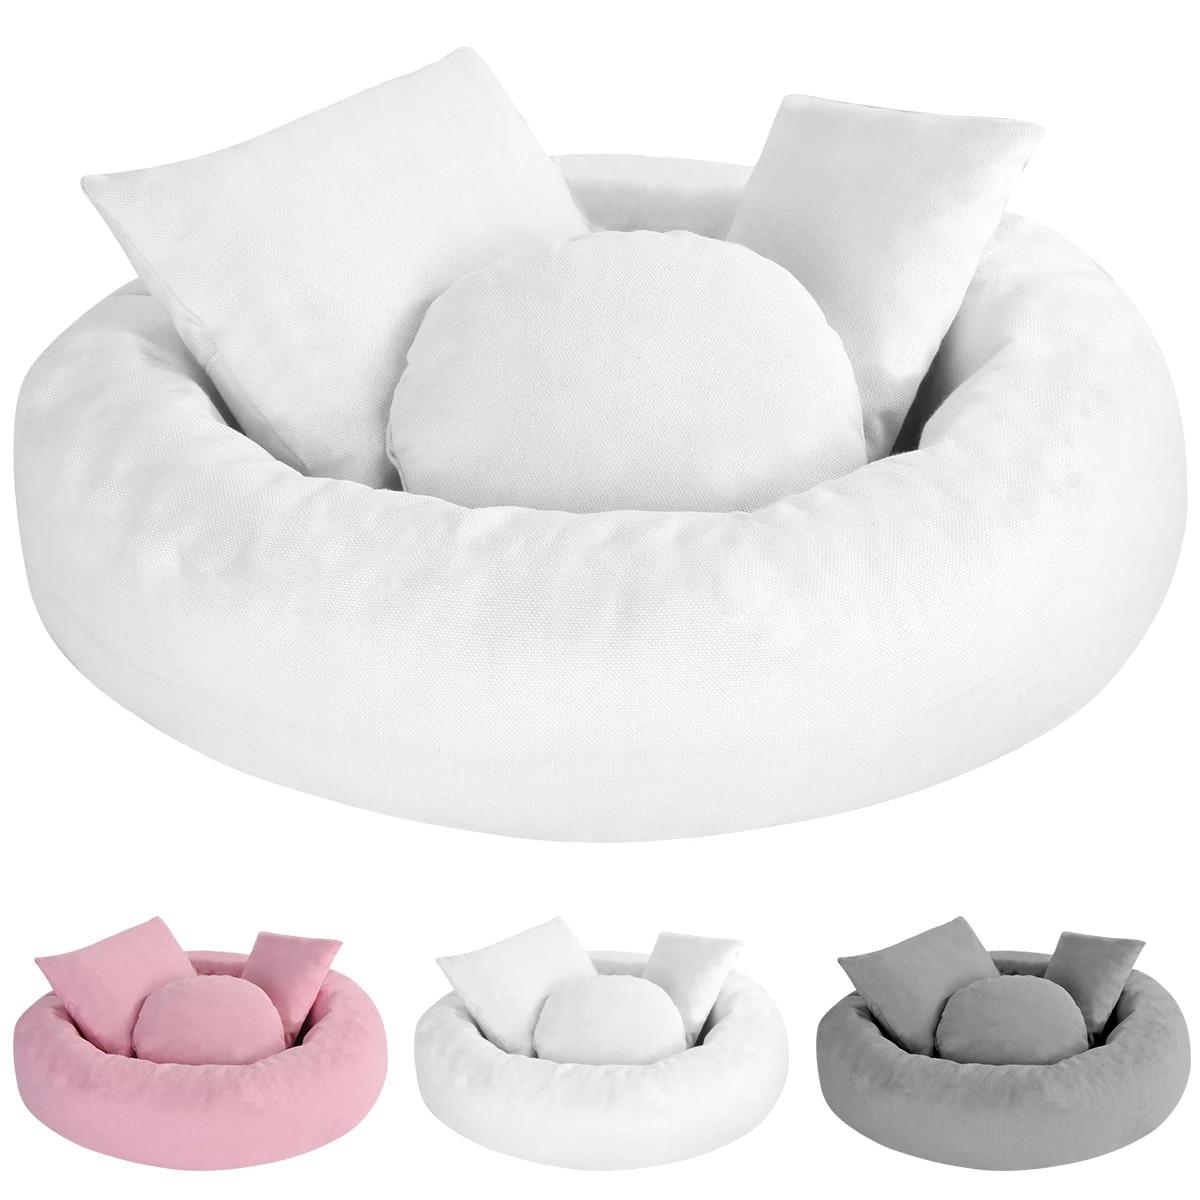 Picture of: Baby Photo Shoot Wheat Donut Posing Props 4 Pcs Set Baby Pillows Ring Newborn Photography Props Basket Filler Fotografia Pillow Aliexpress